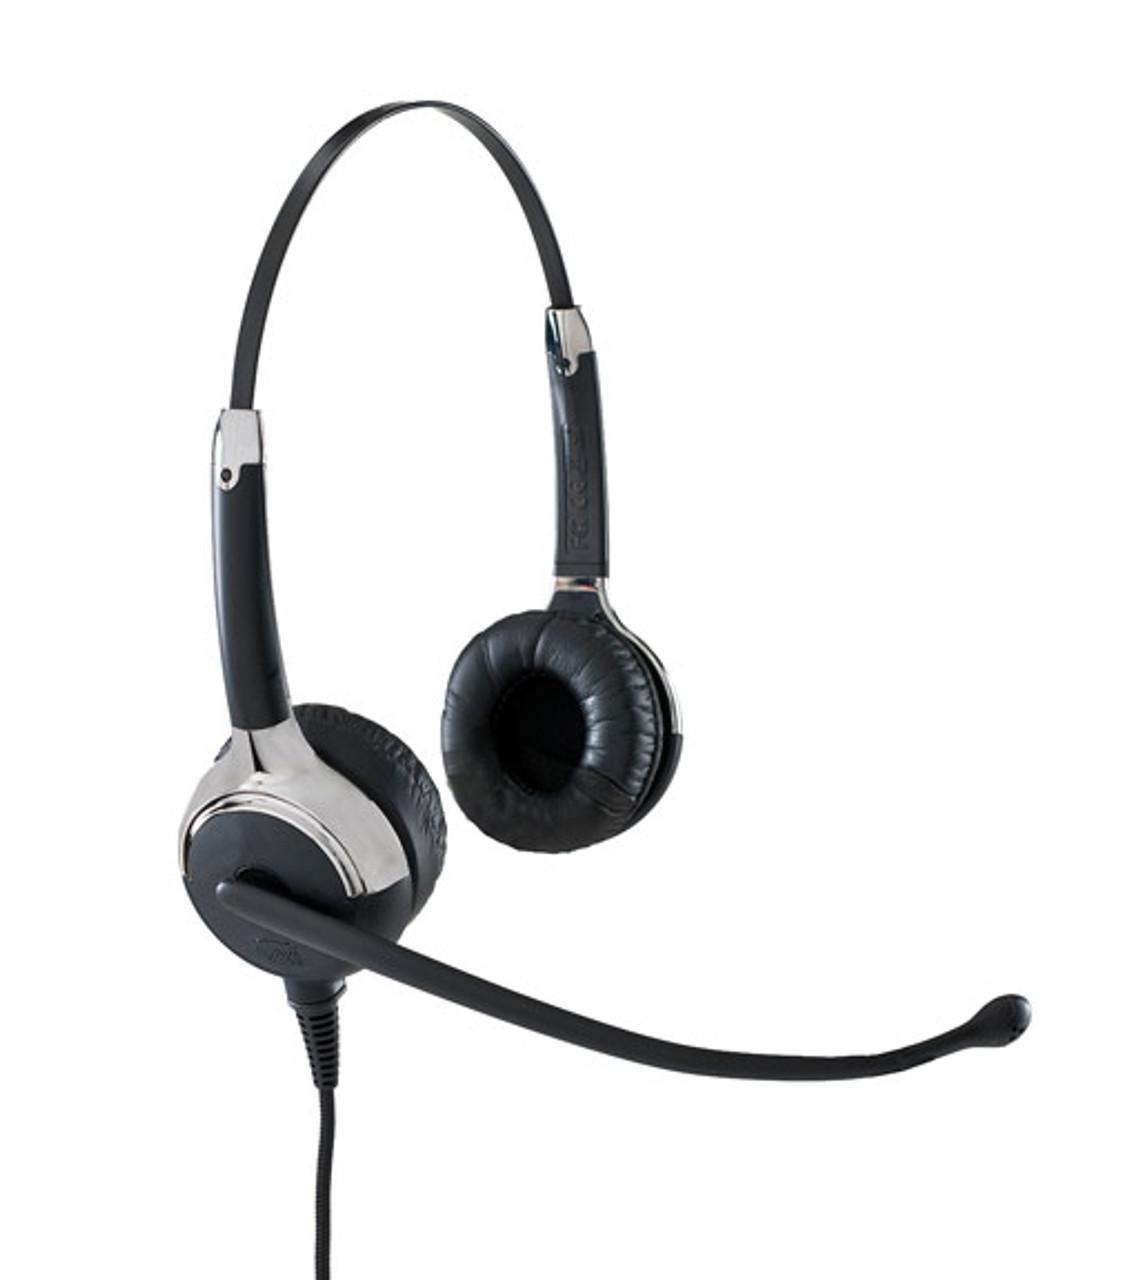 Vxi Proset 21v Duo Stereo Telephone Headset Vxi 203052 Wideband Audio Headset Avaya Nortel Cisco Ibm Mitel Nec And Many More